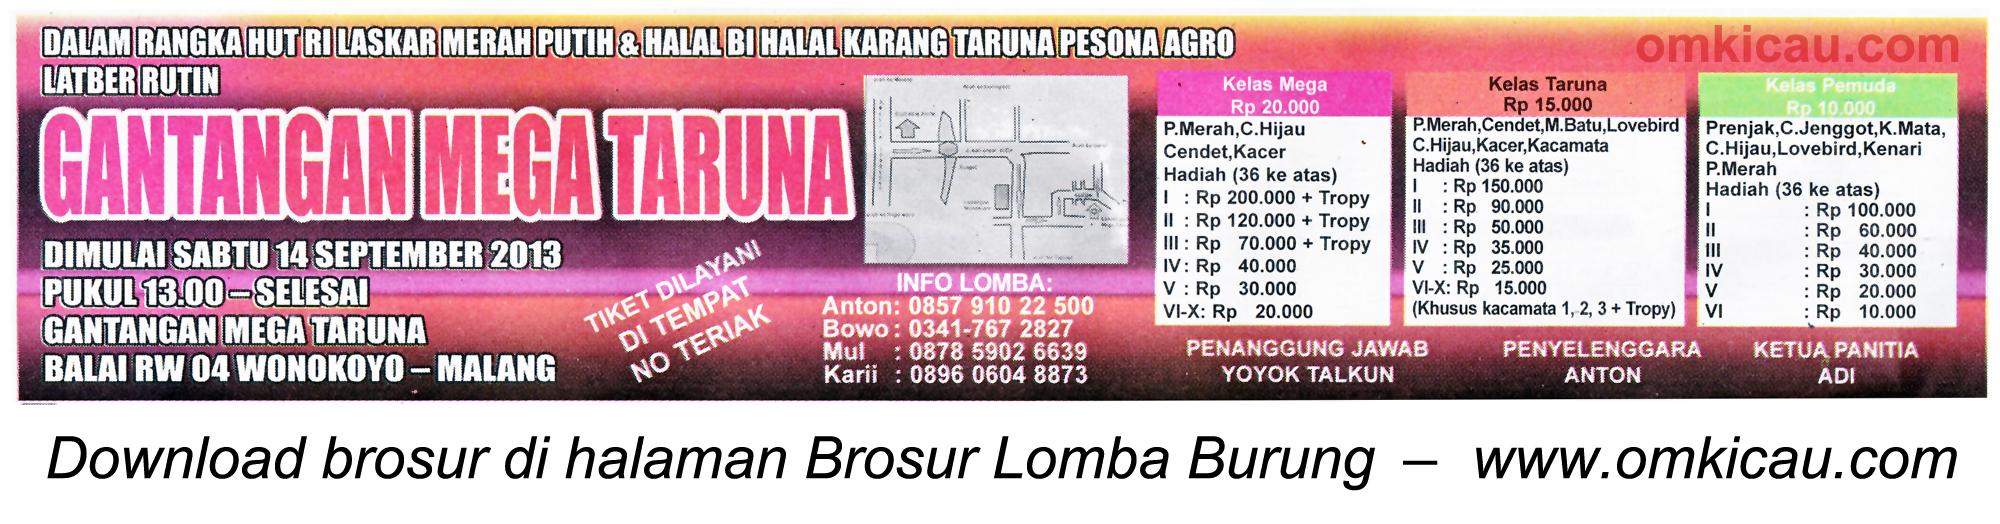 Brosur Latpres Gantangan Mega Taruna Malang 14 Sept 2013